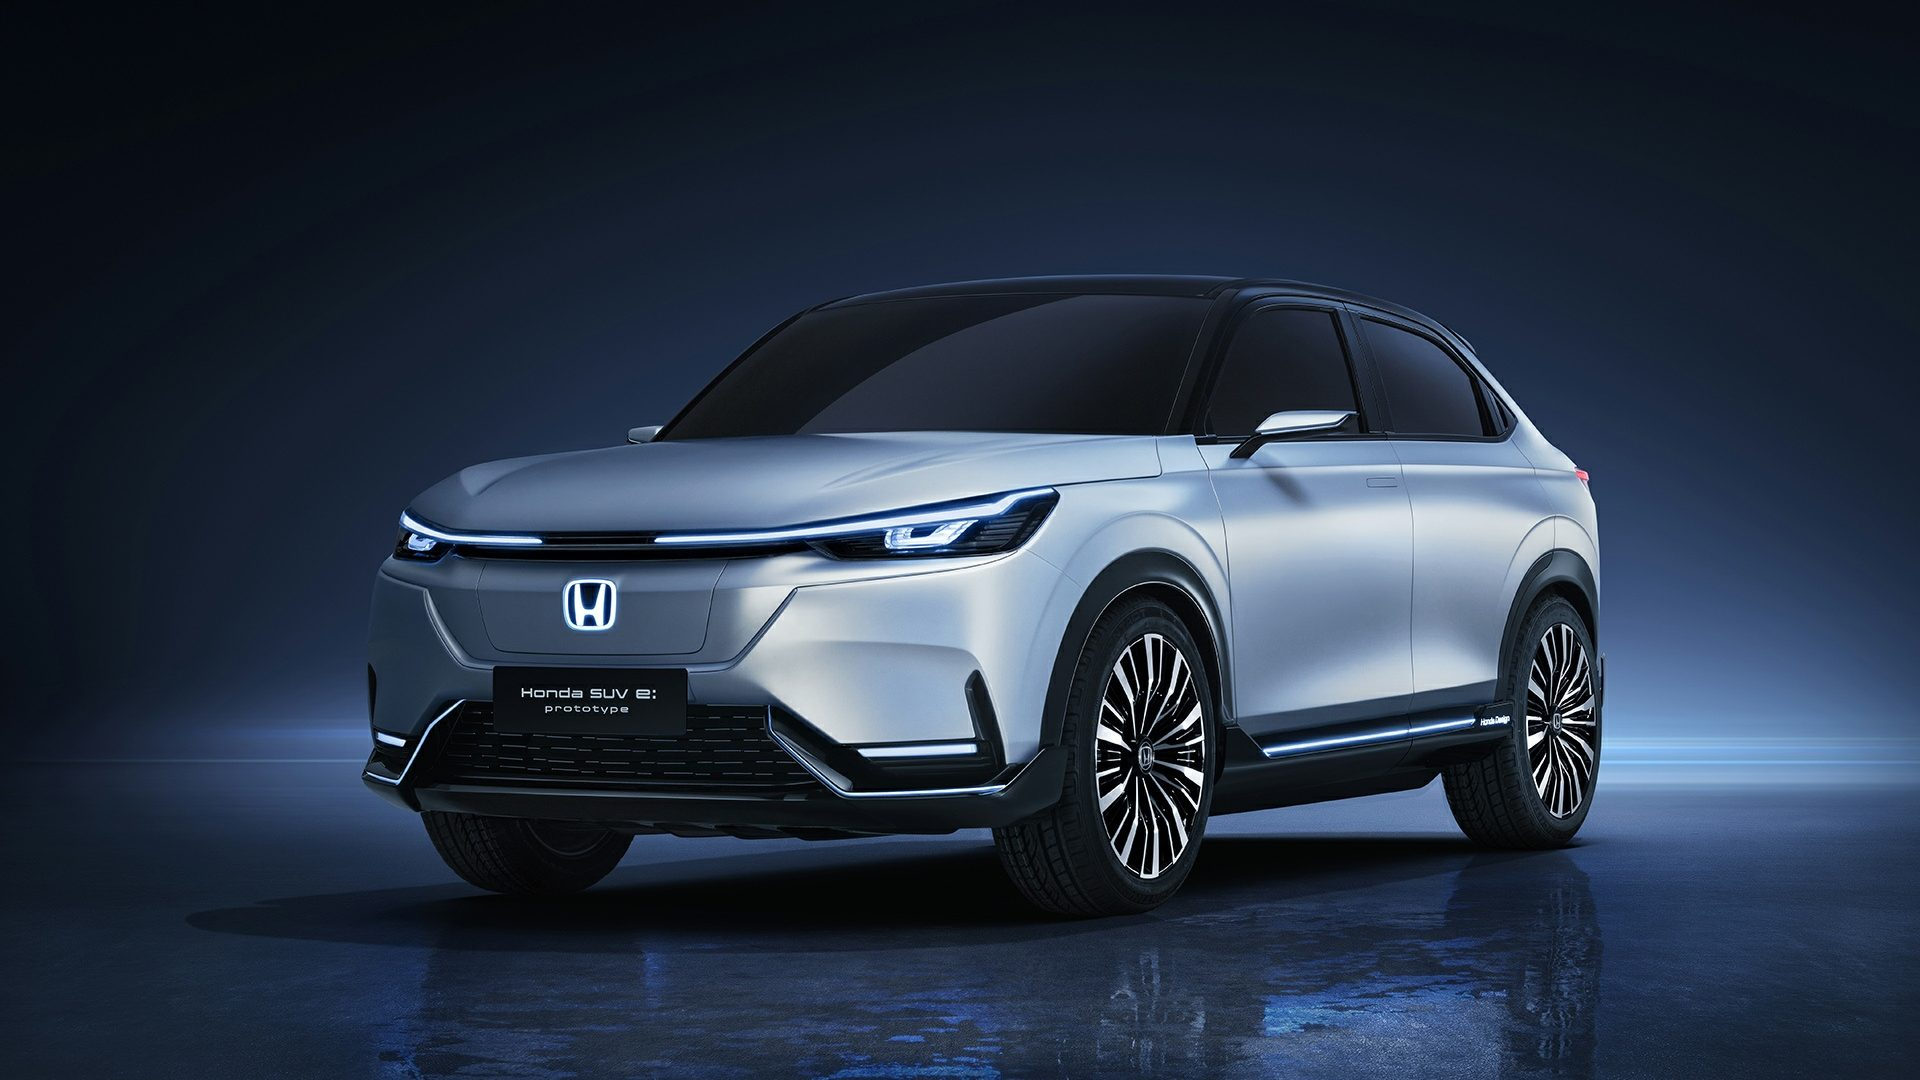 2021-Honda-SUV-e-prototype-01